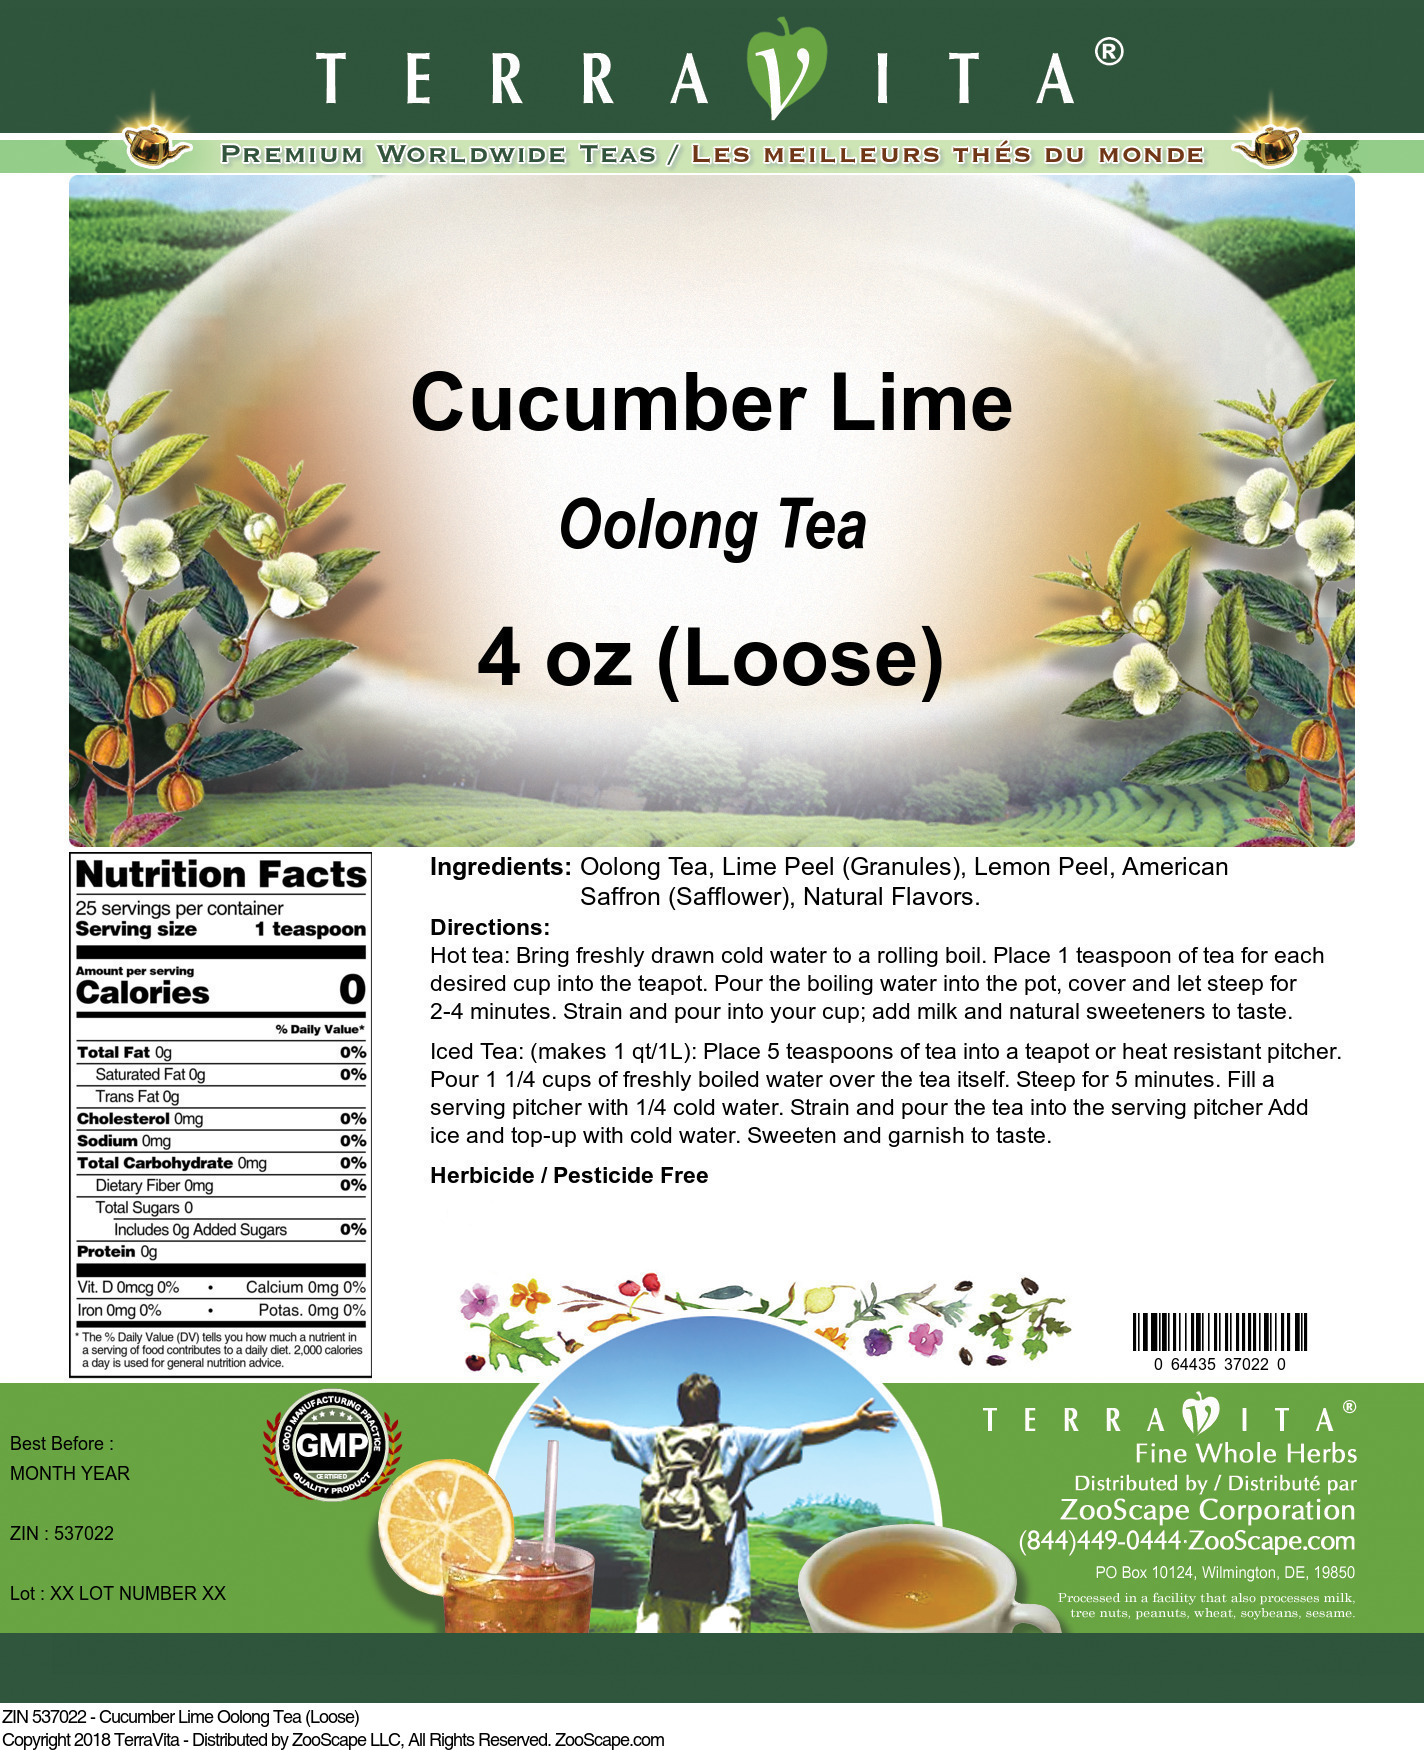 Cucumber Lime Oolong Tea